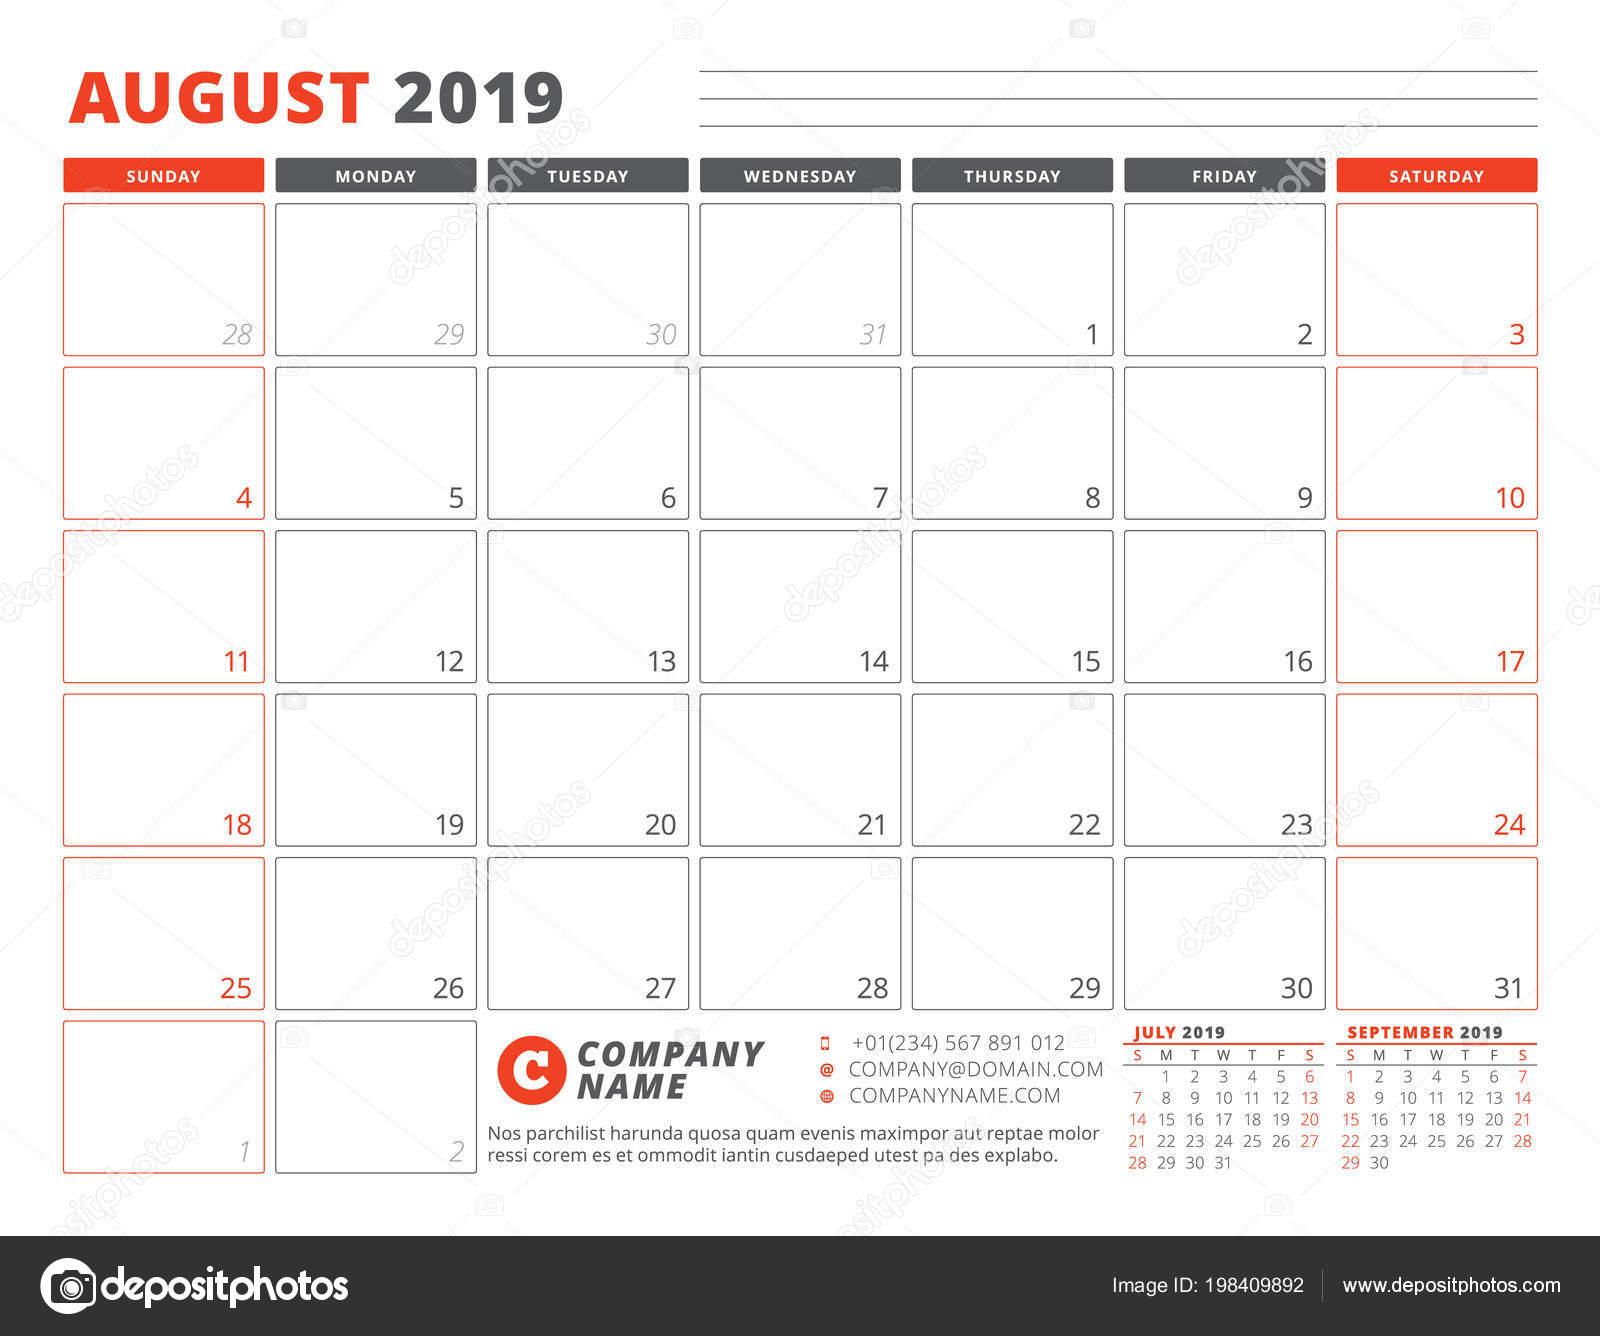 Schema Calendario Mensile.Modello Calendario Agosto 2019 Modello Business Planner